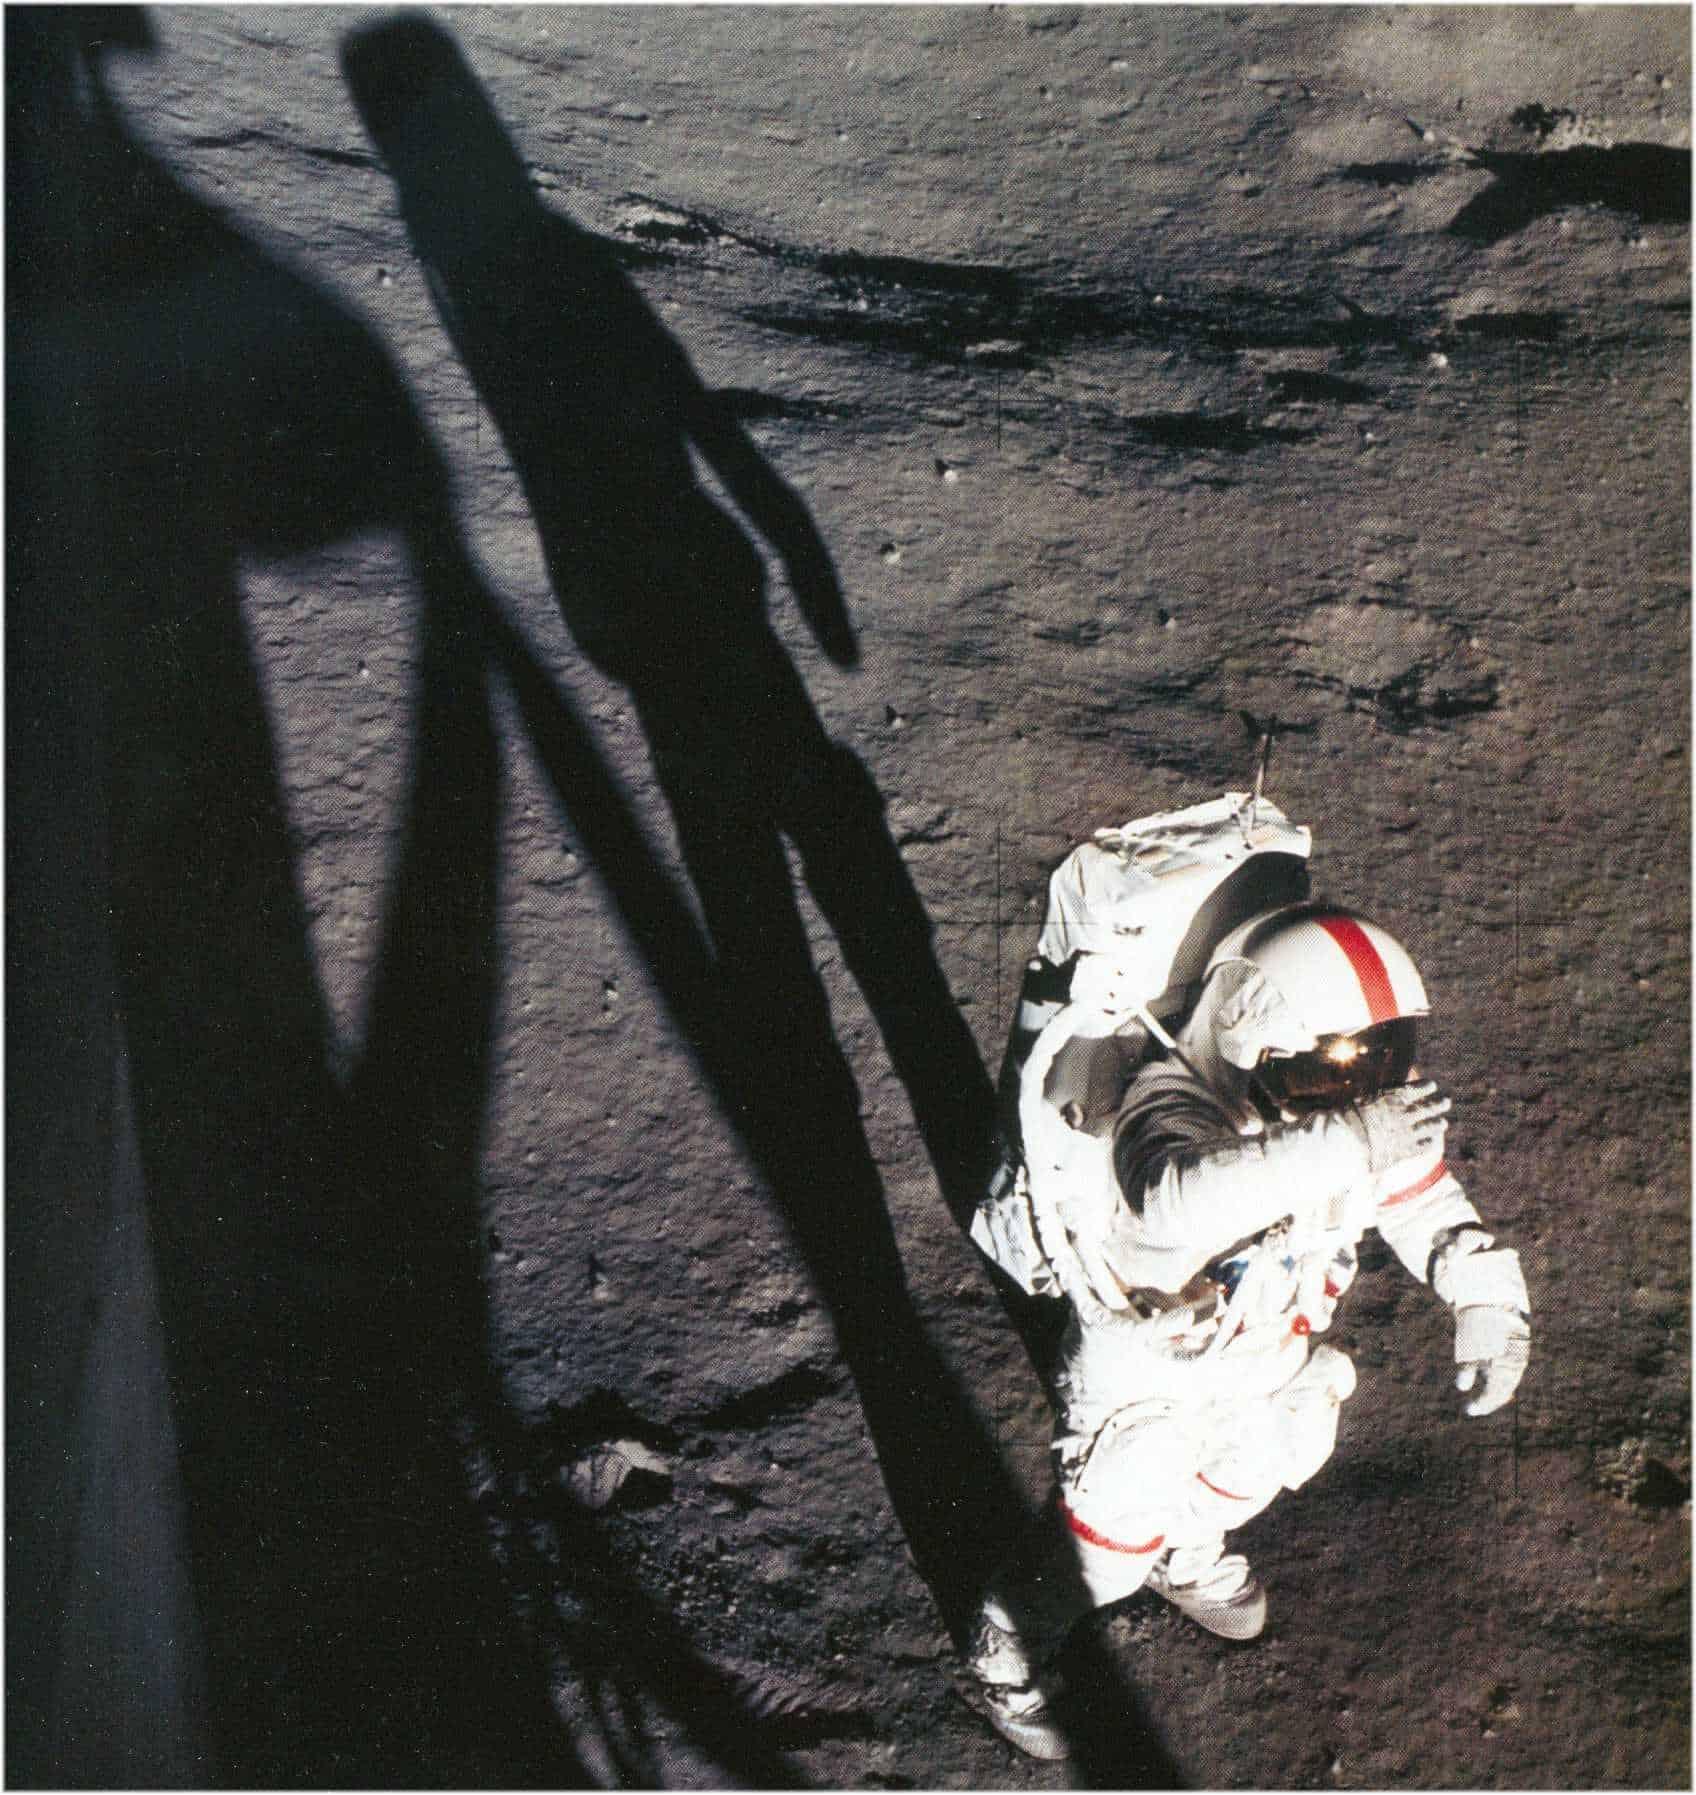 Neil Armstrong 1969 am Mond Aufnahme NASA US